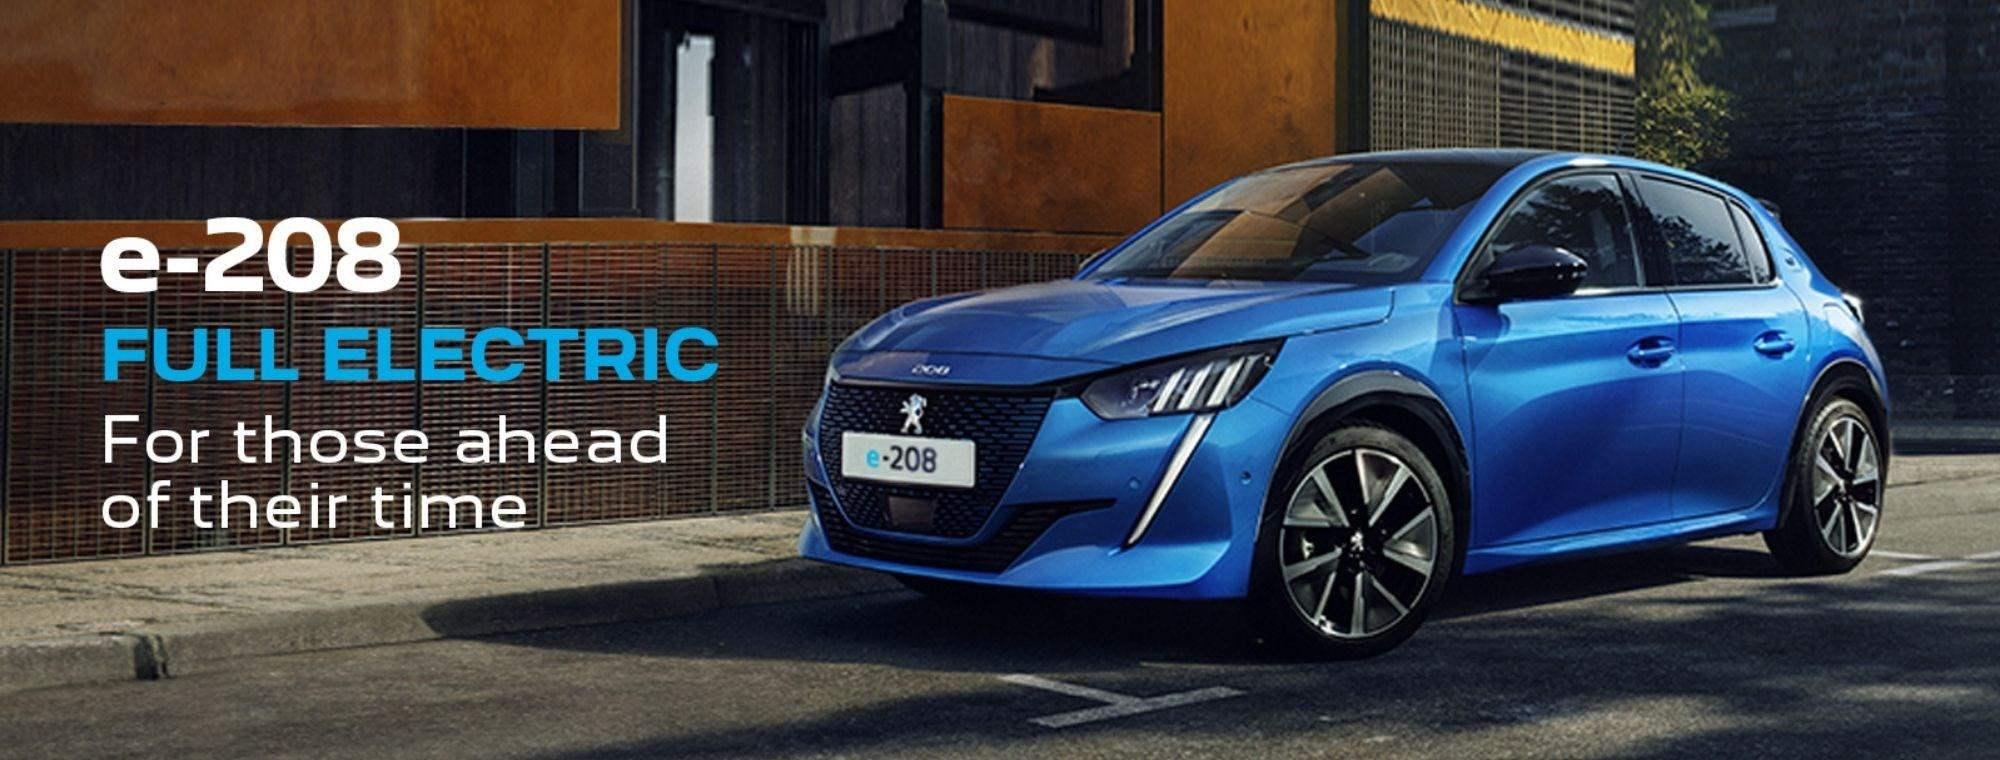 All-New Peugeot 208 at Chippenham Motor Company